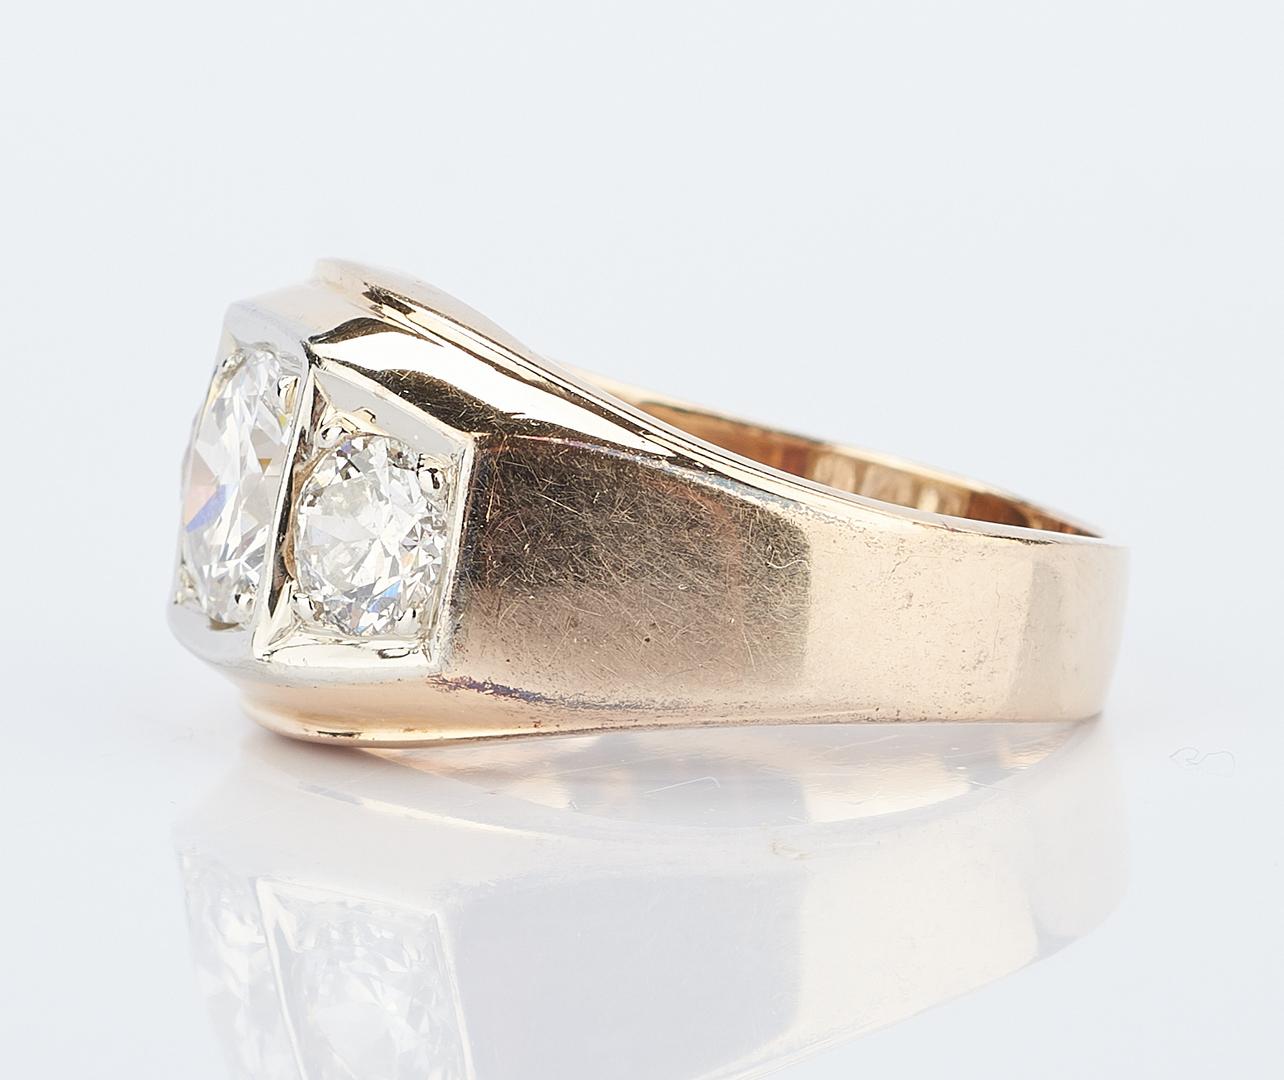 Lot 215: Men's 14K and 3 Stone Diamond Ring, 2.25 Carats